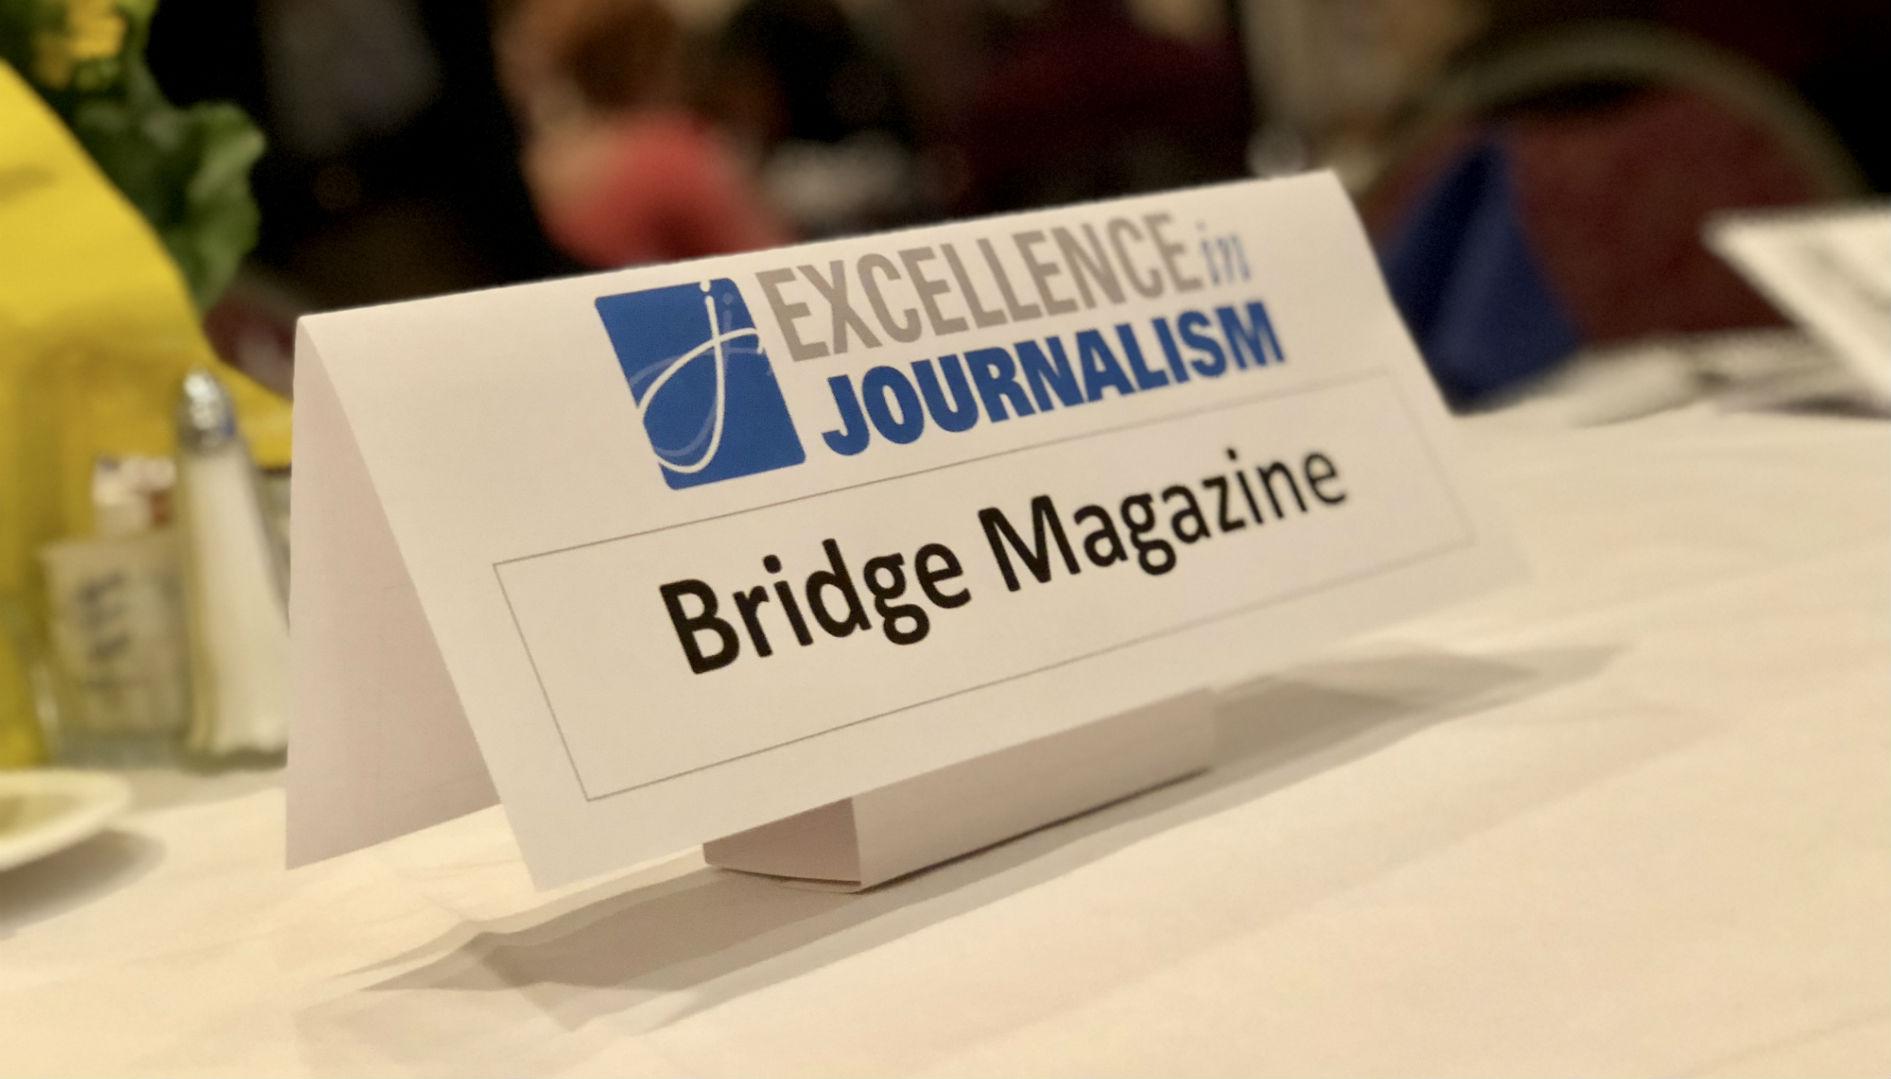 SPJ Excellence in Journalism - Bridge